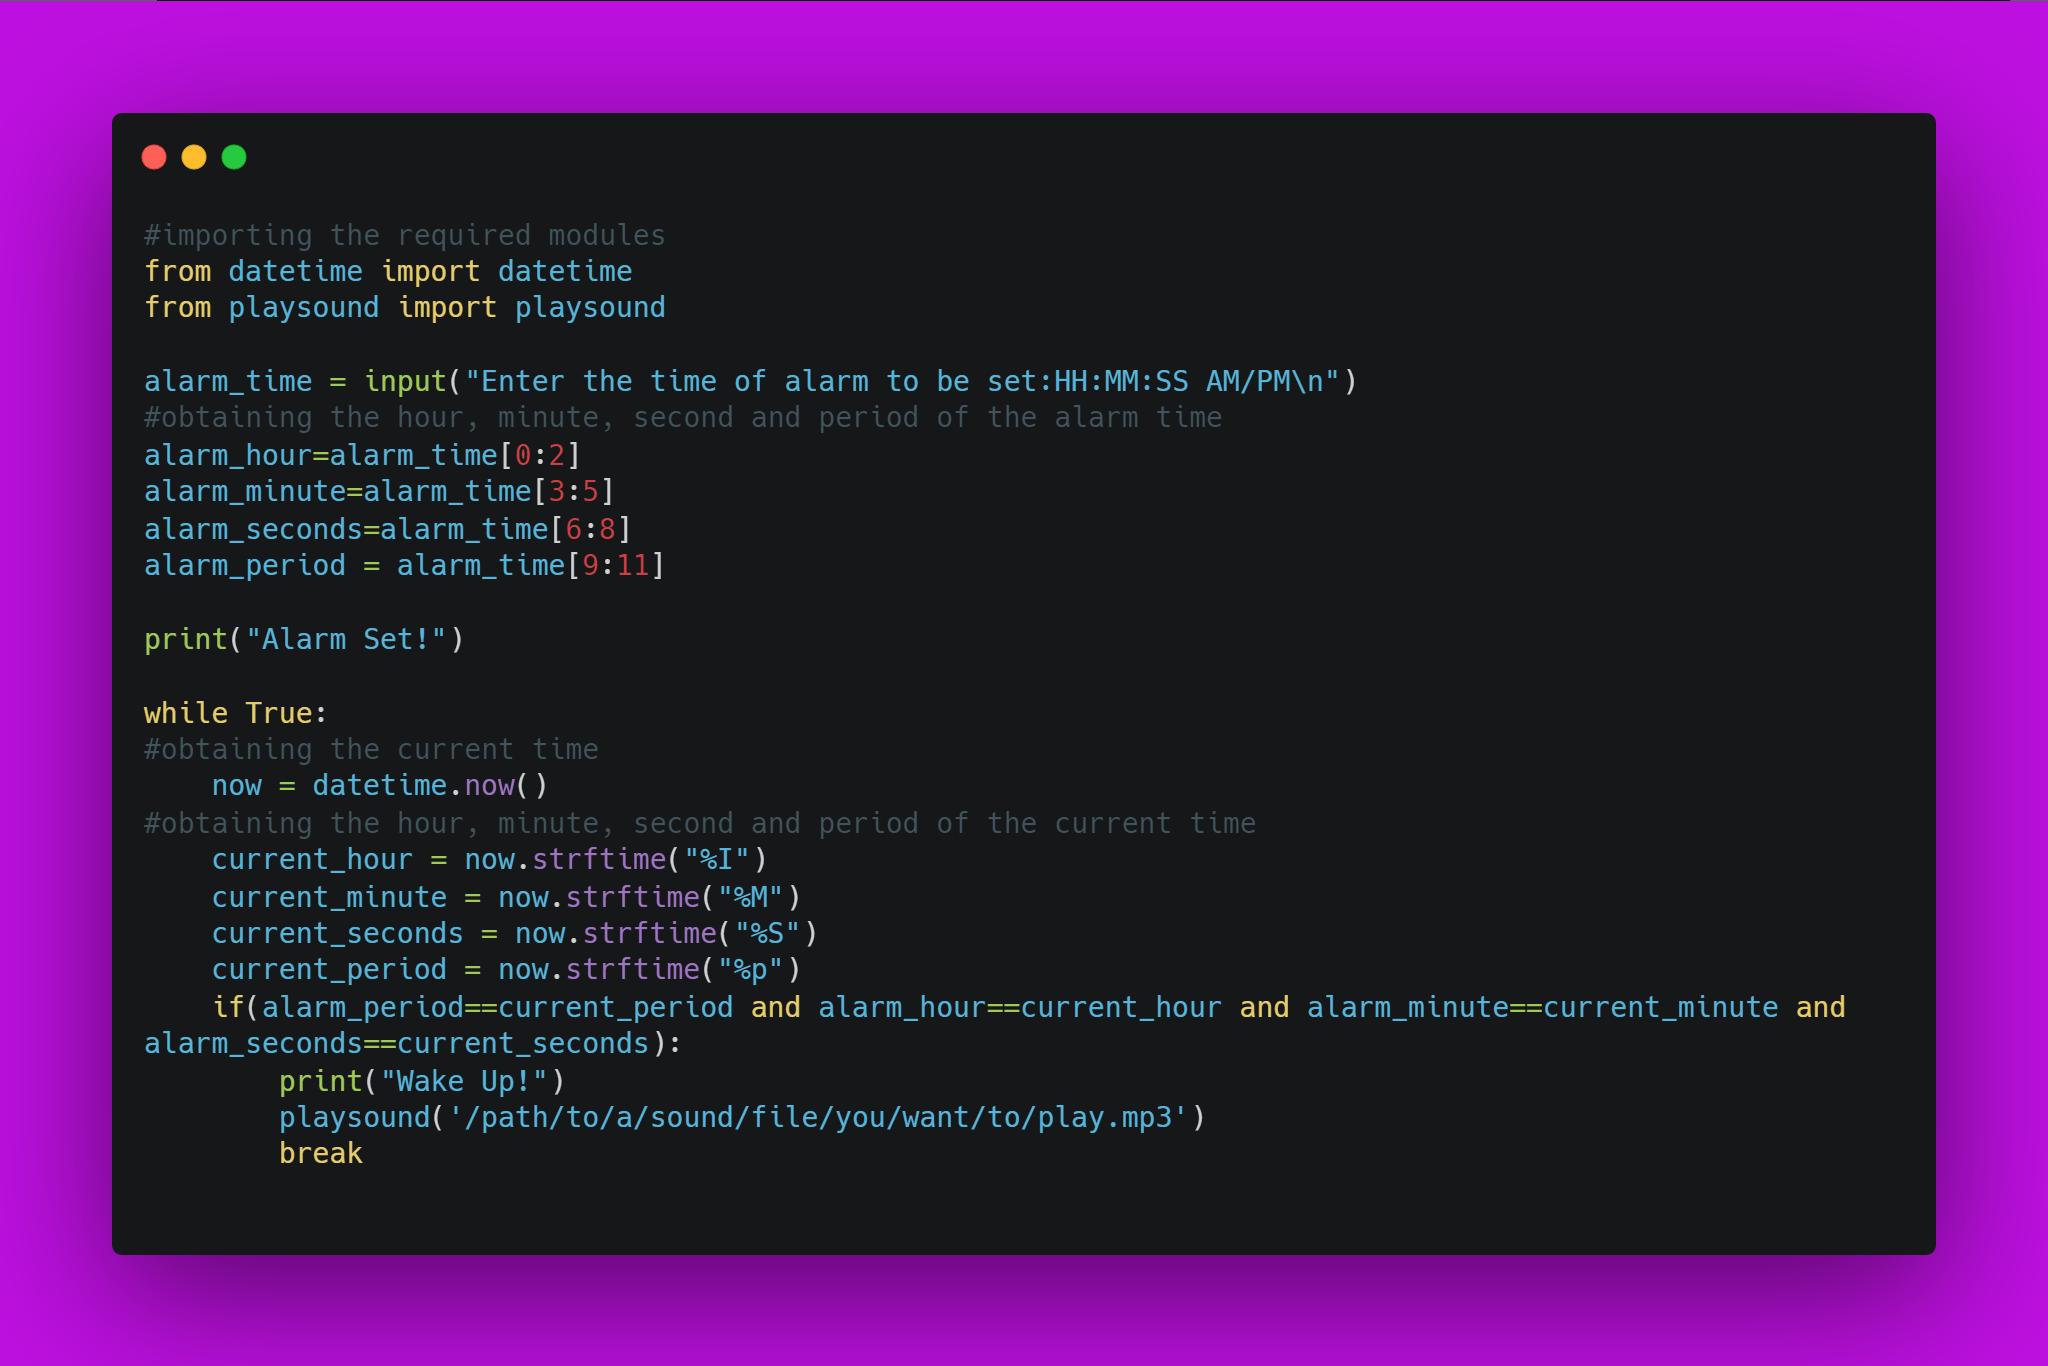 Source code of building an alarm clock using python